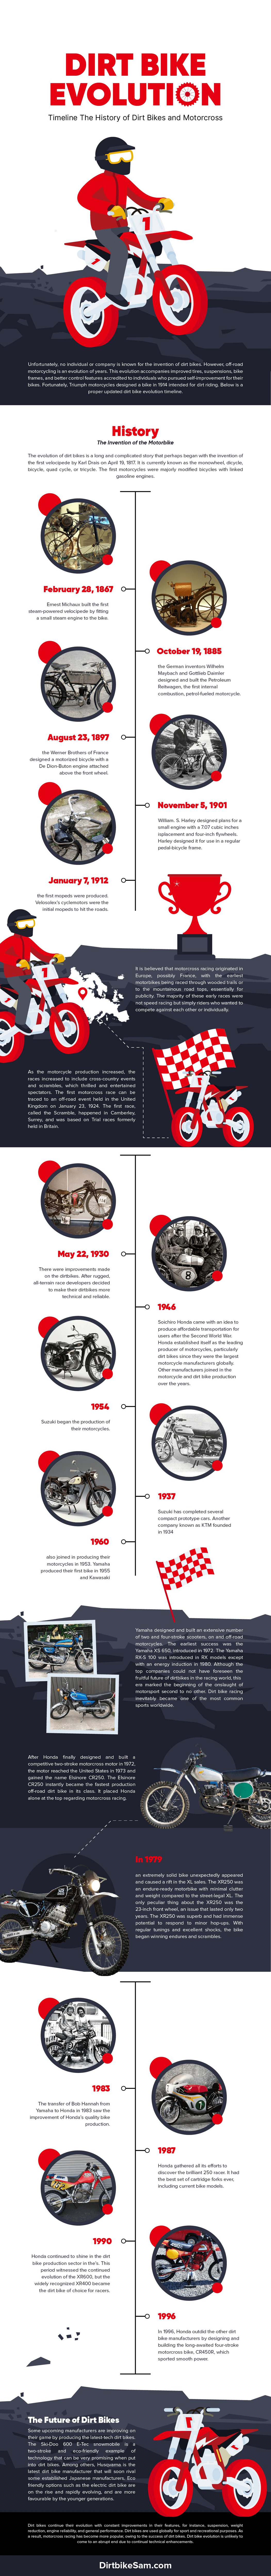 Dirtbike Evolution History Timeline